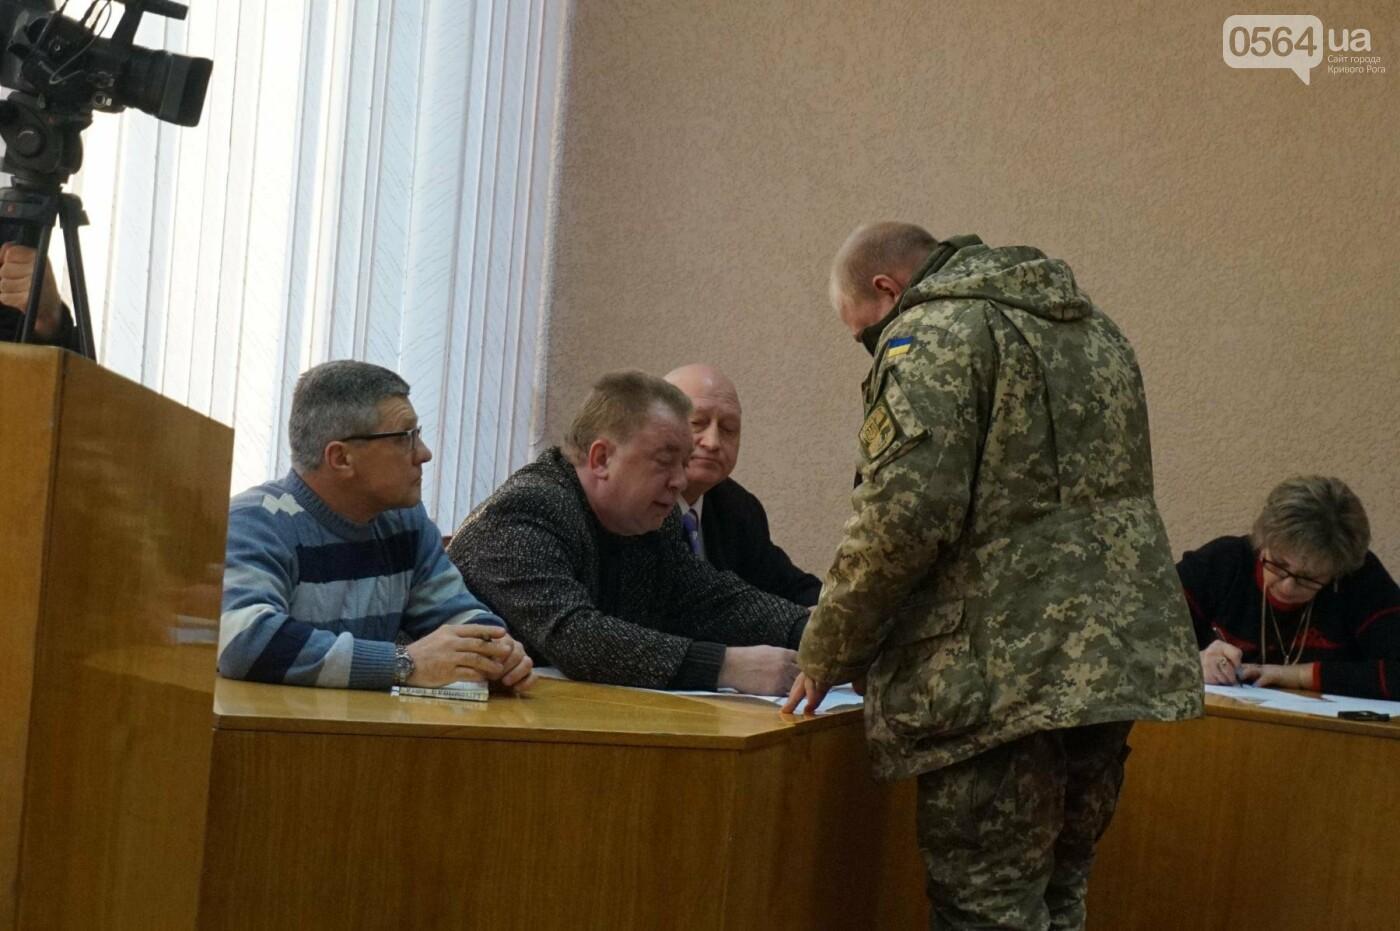 В Кривом Роге: облили зеленкой депутата, обокрали храм УПЦ МП, выдали землю бойцам АТО, фото-3